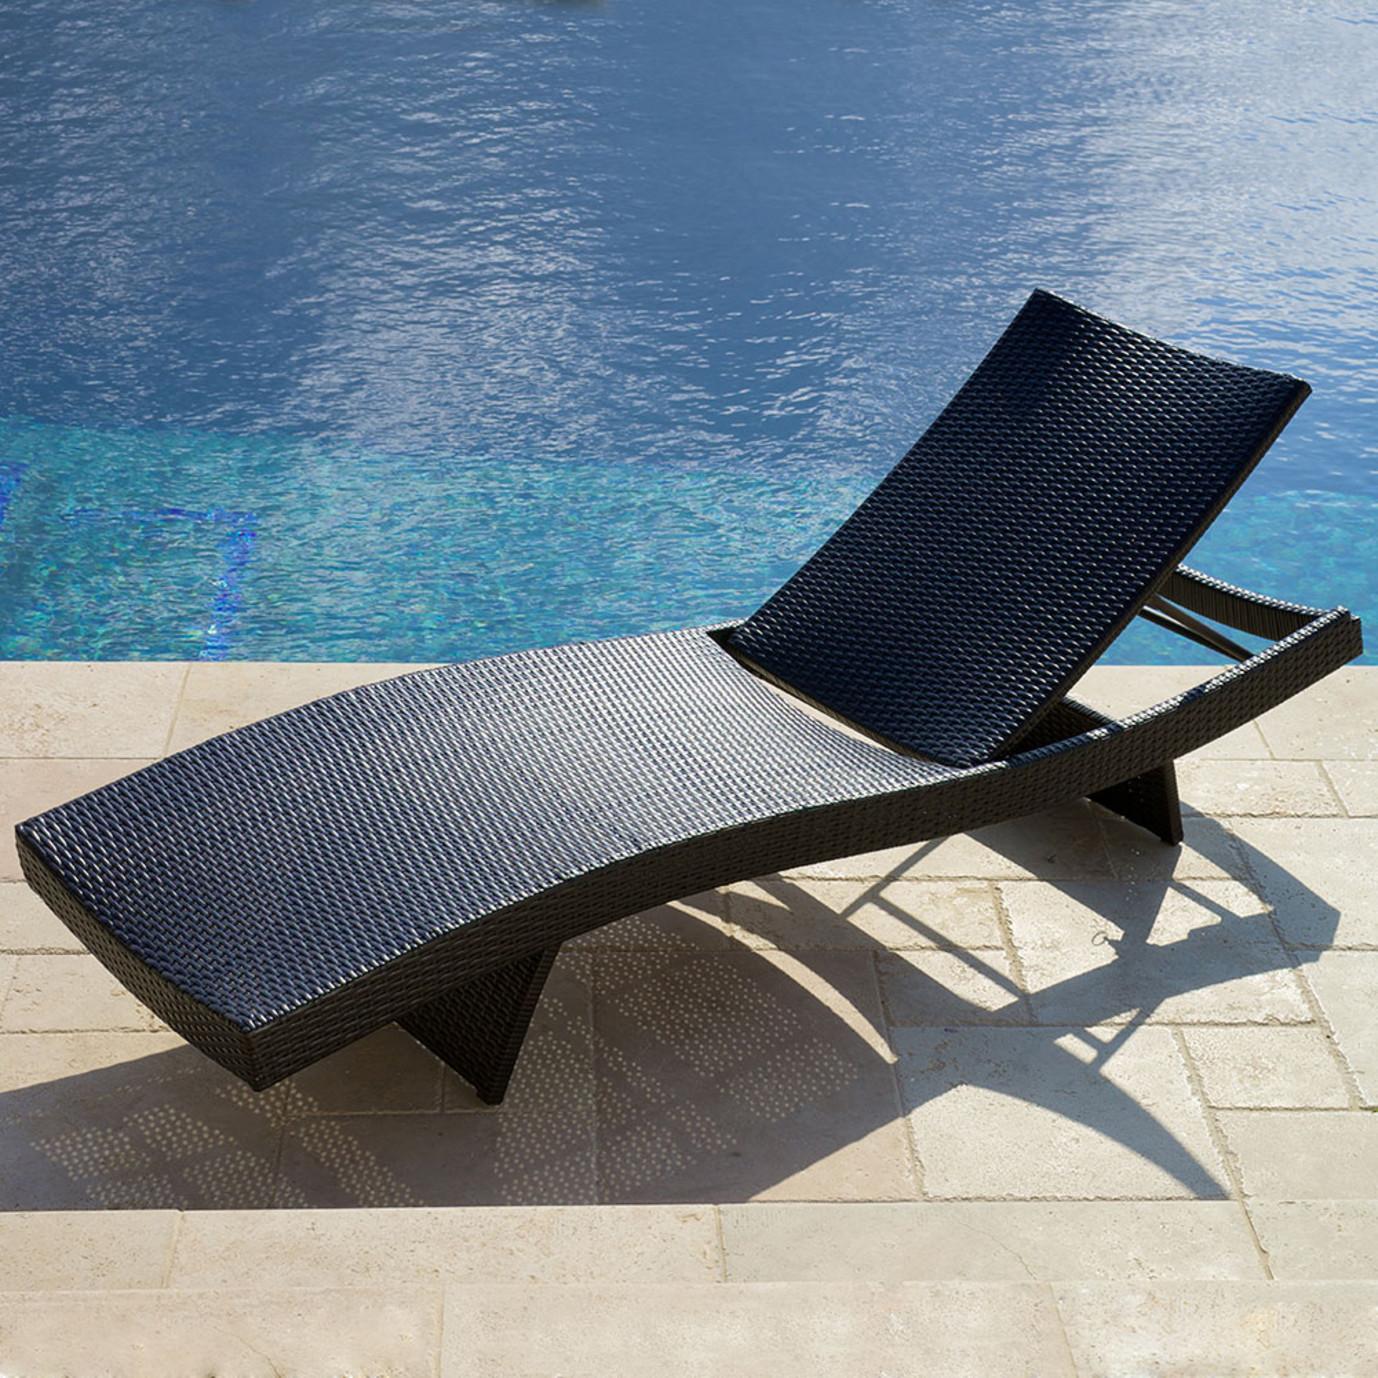 portofino comfort chaise lounges espresso rst brands. Black Bedroom Furniture Sets. Home Design Ideas